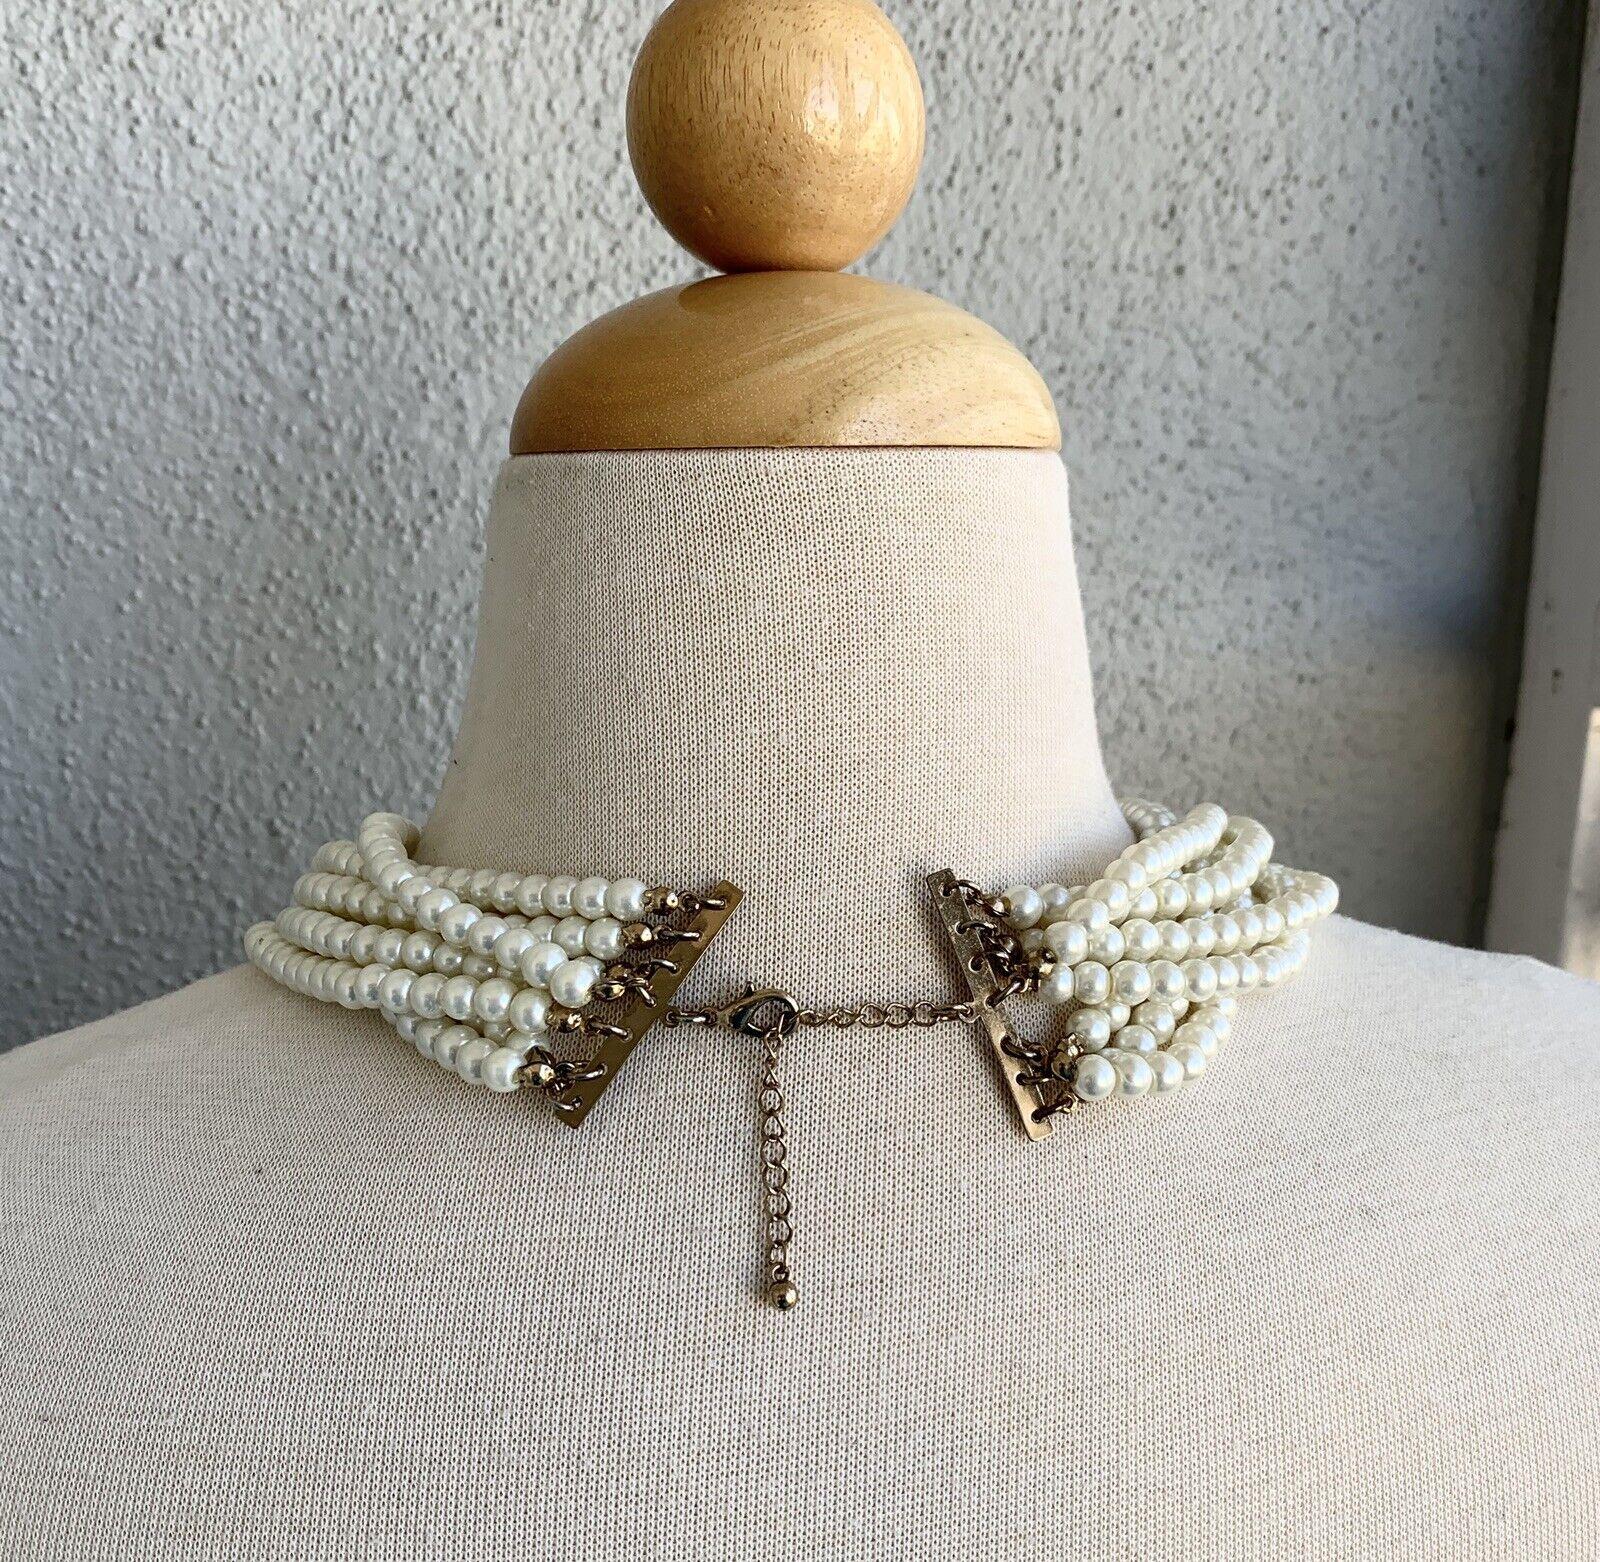 Vintage Faux Pearl Necklace  - image 3